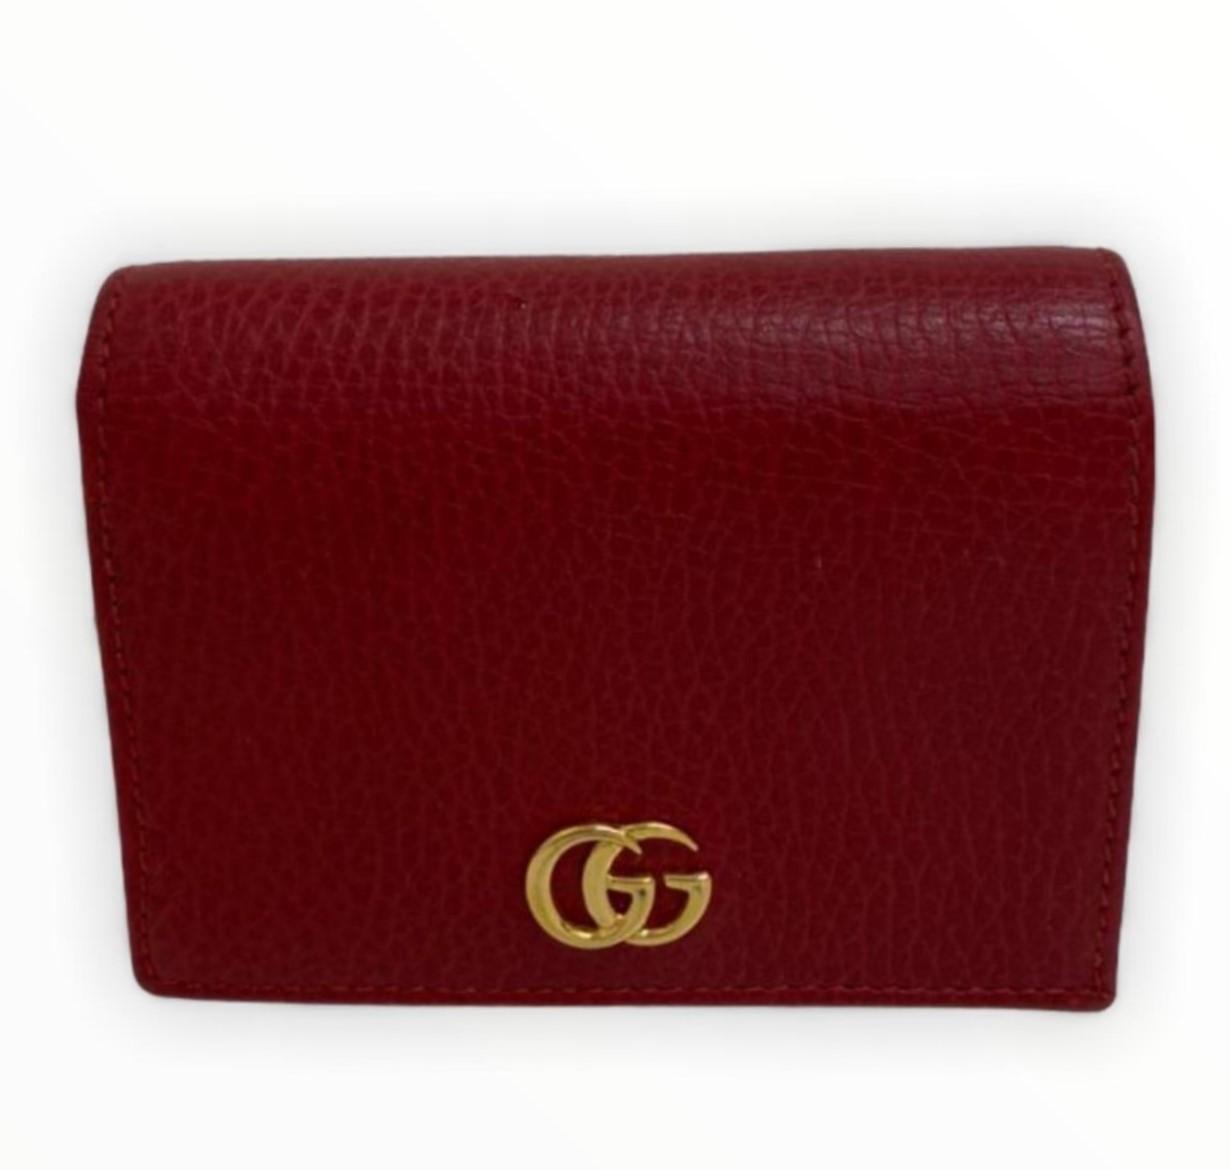 Carteira Gucci GG Marmont Grained-Leather Vermelha